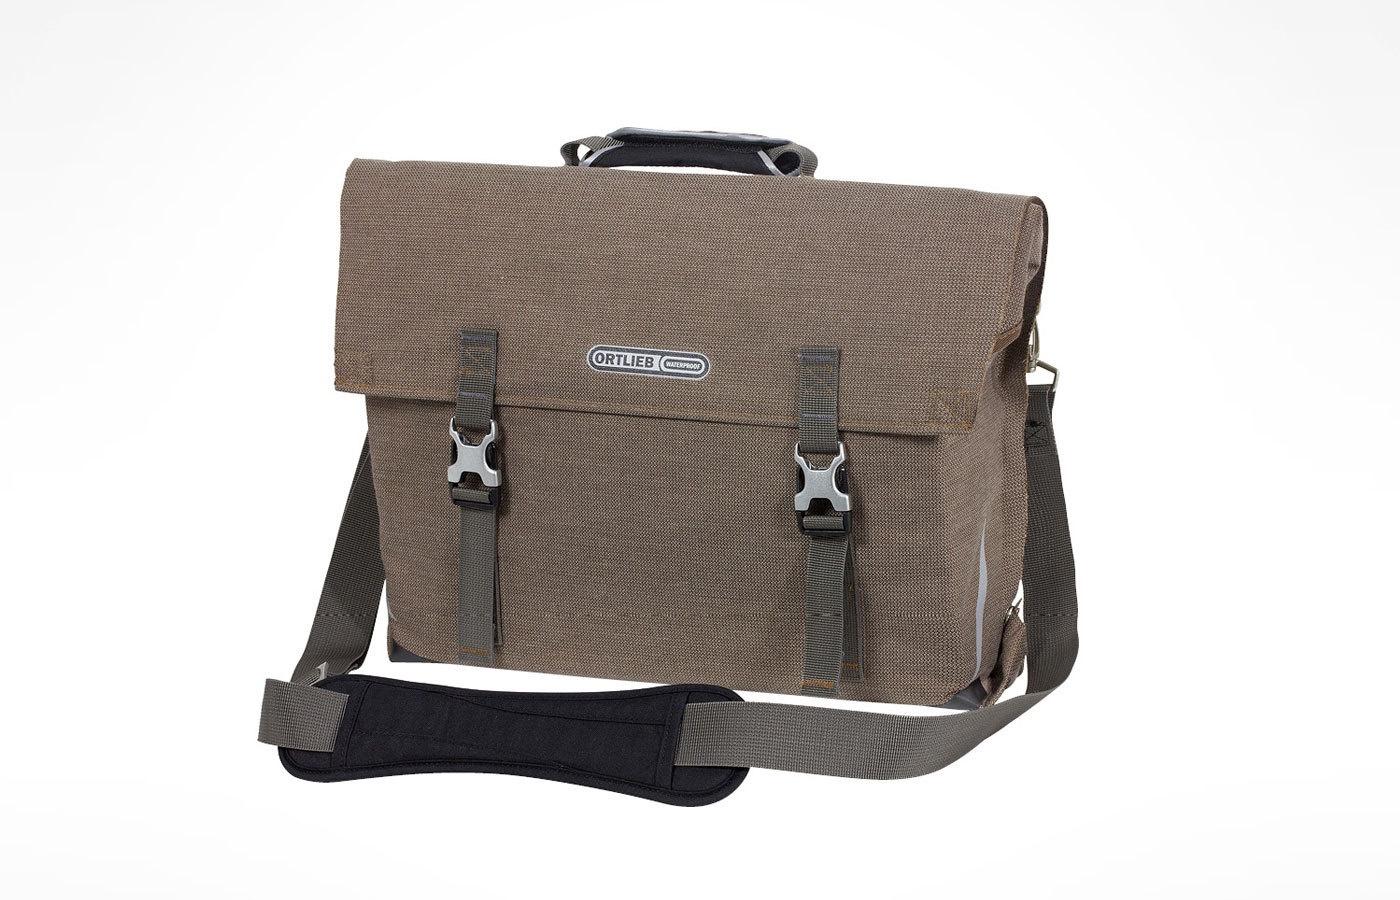 Ortlieb Commuter Bag Urban LineQL2.1